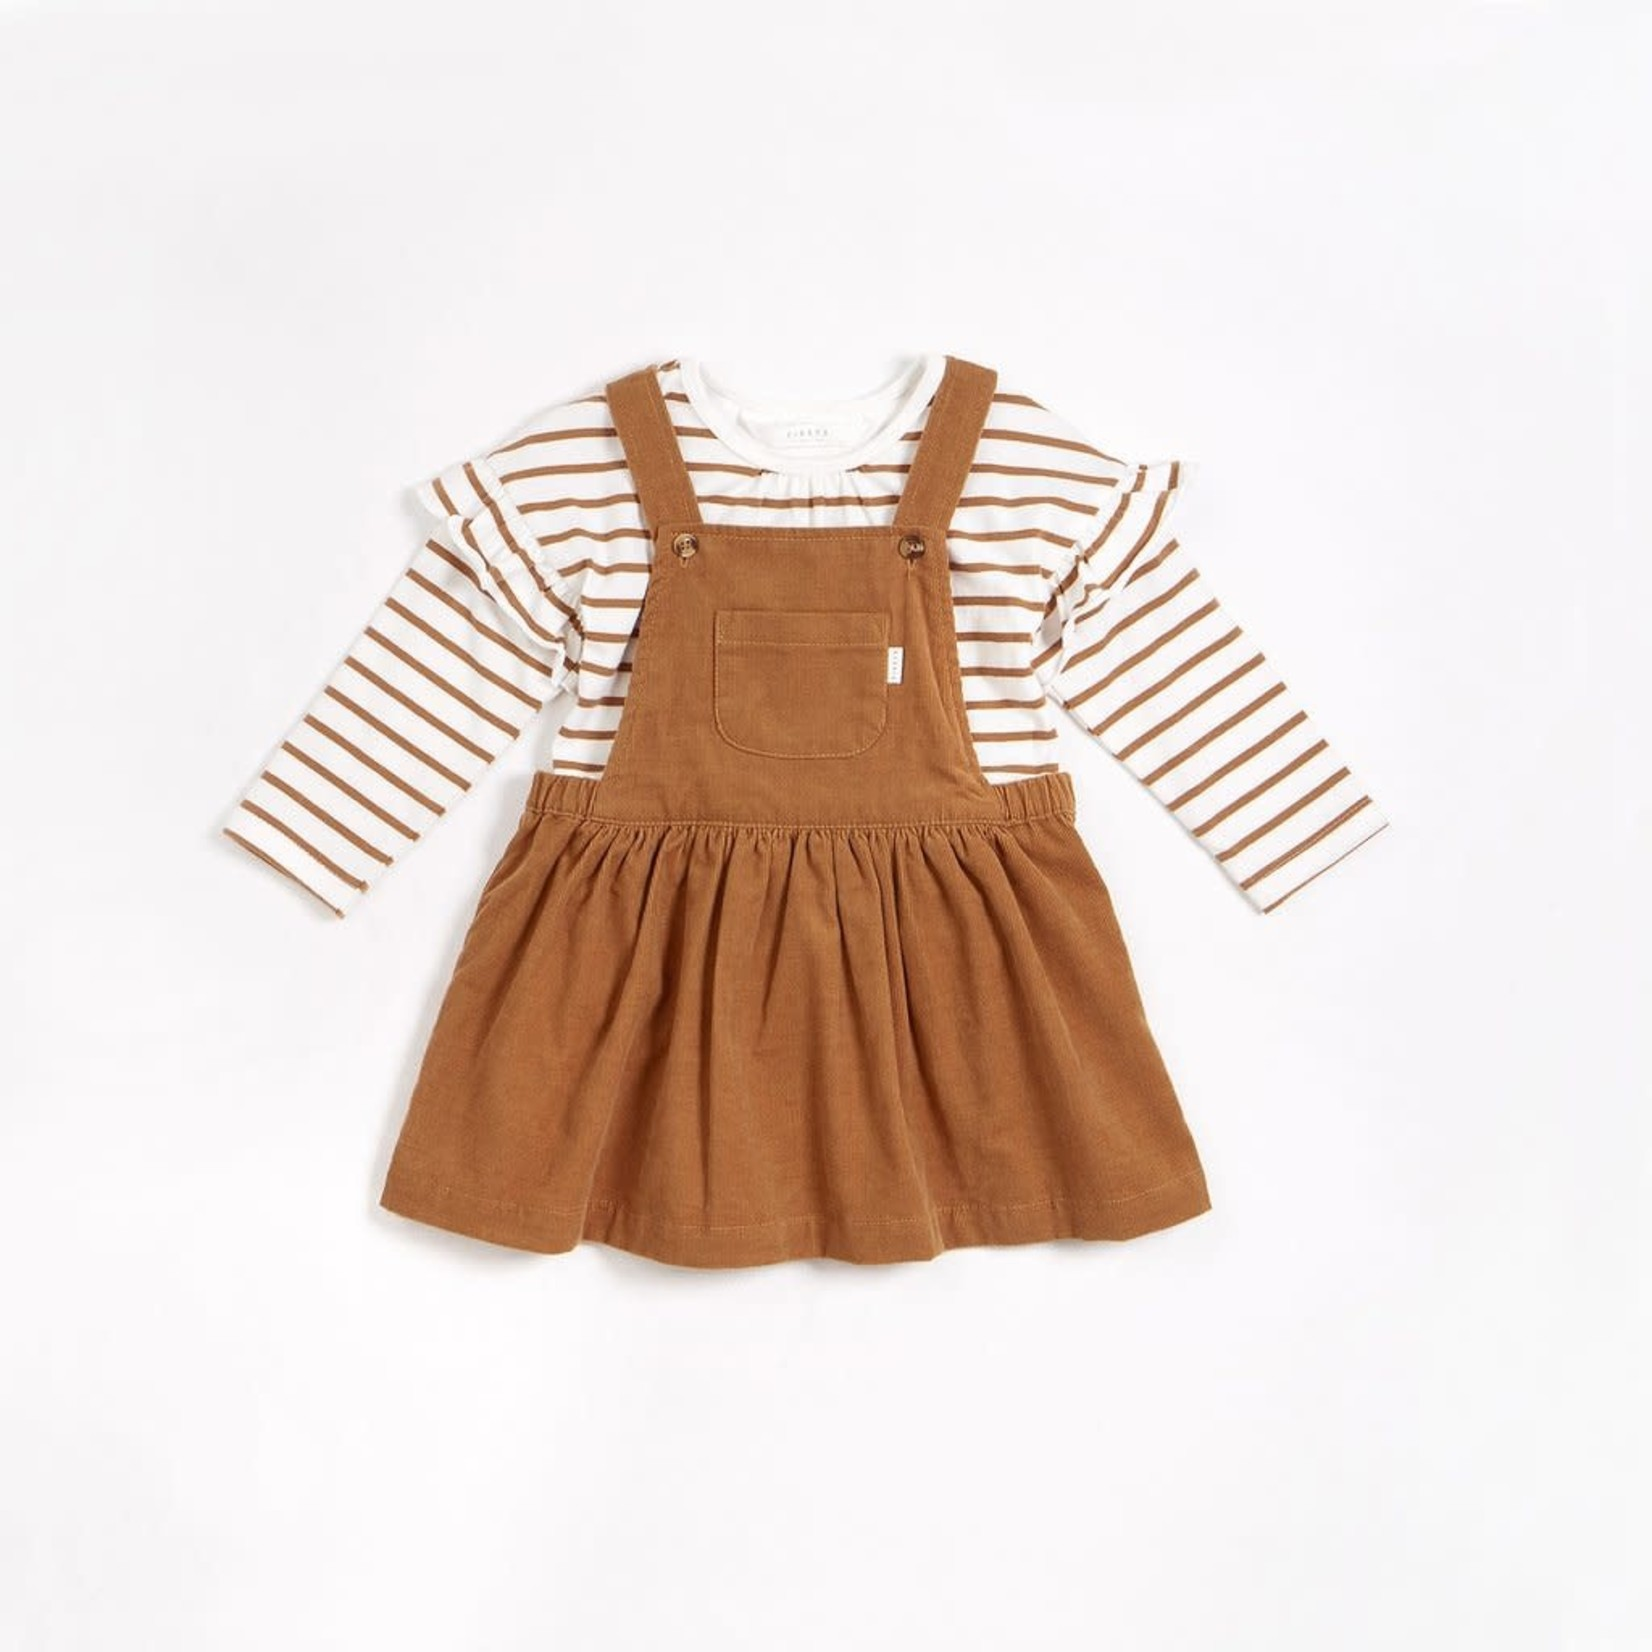 Petit Lem Golden Wheat Mini-Cord Overalls Dress Set with Stripe Top (2 pcs.)